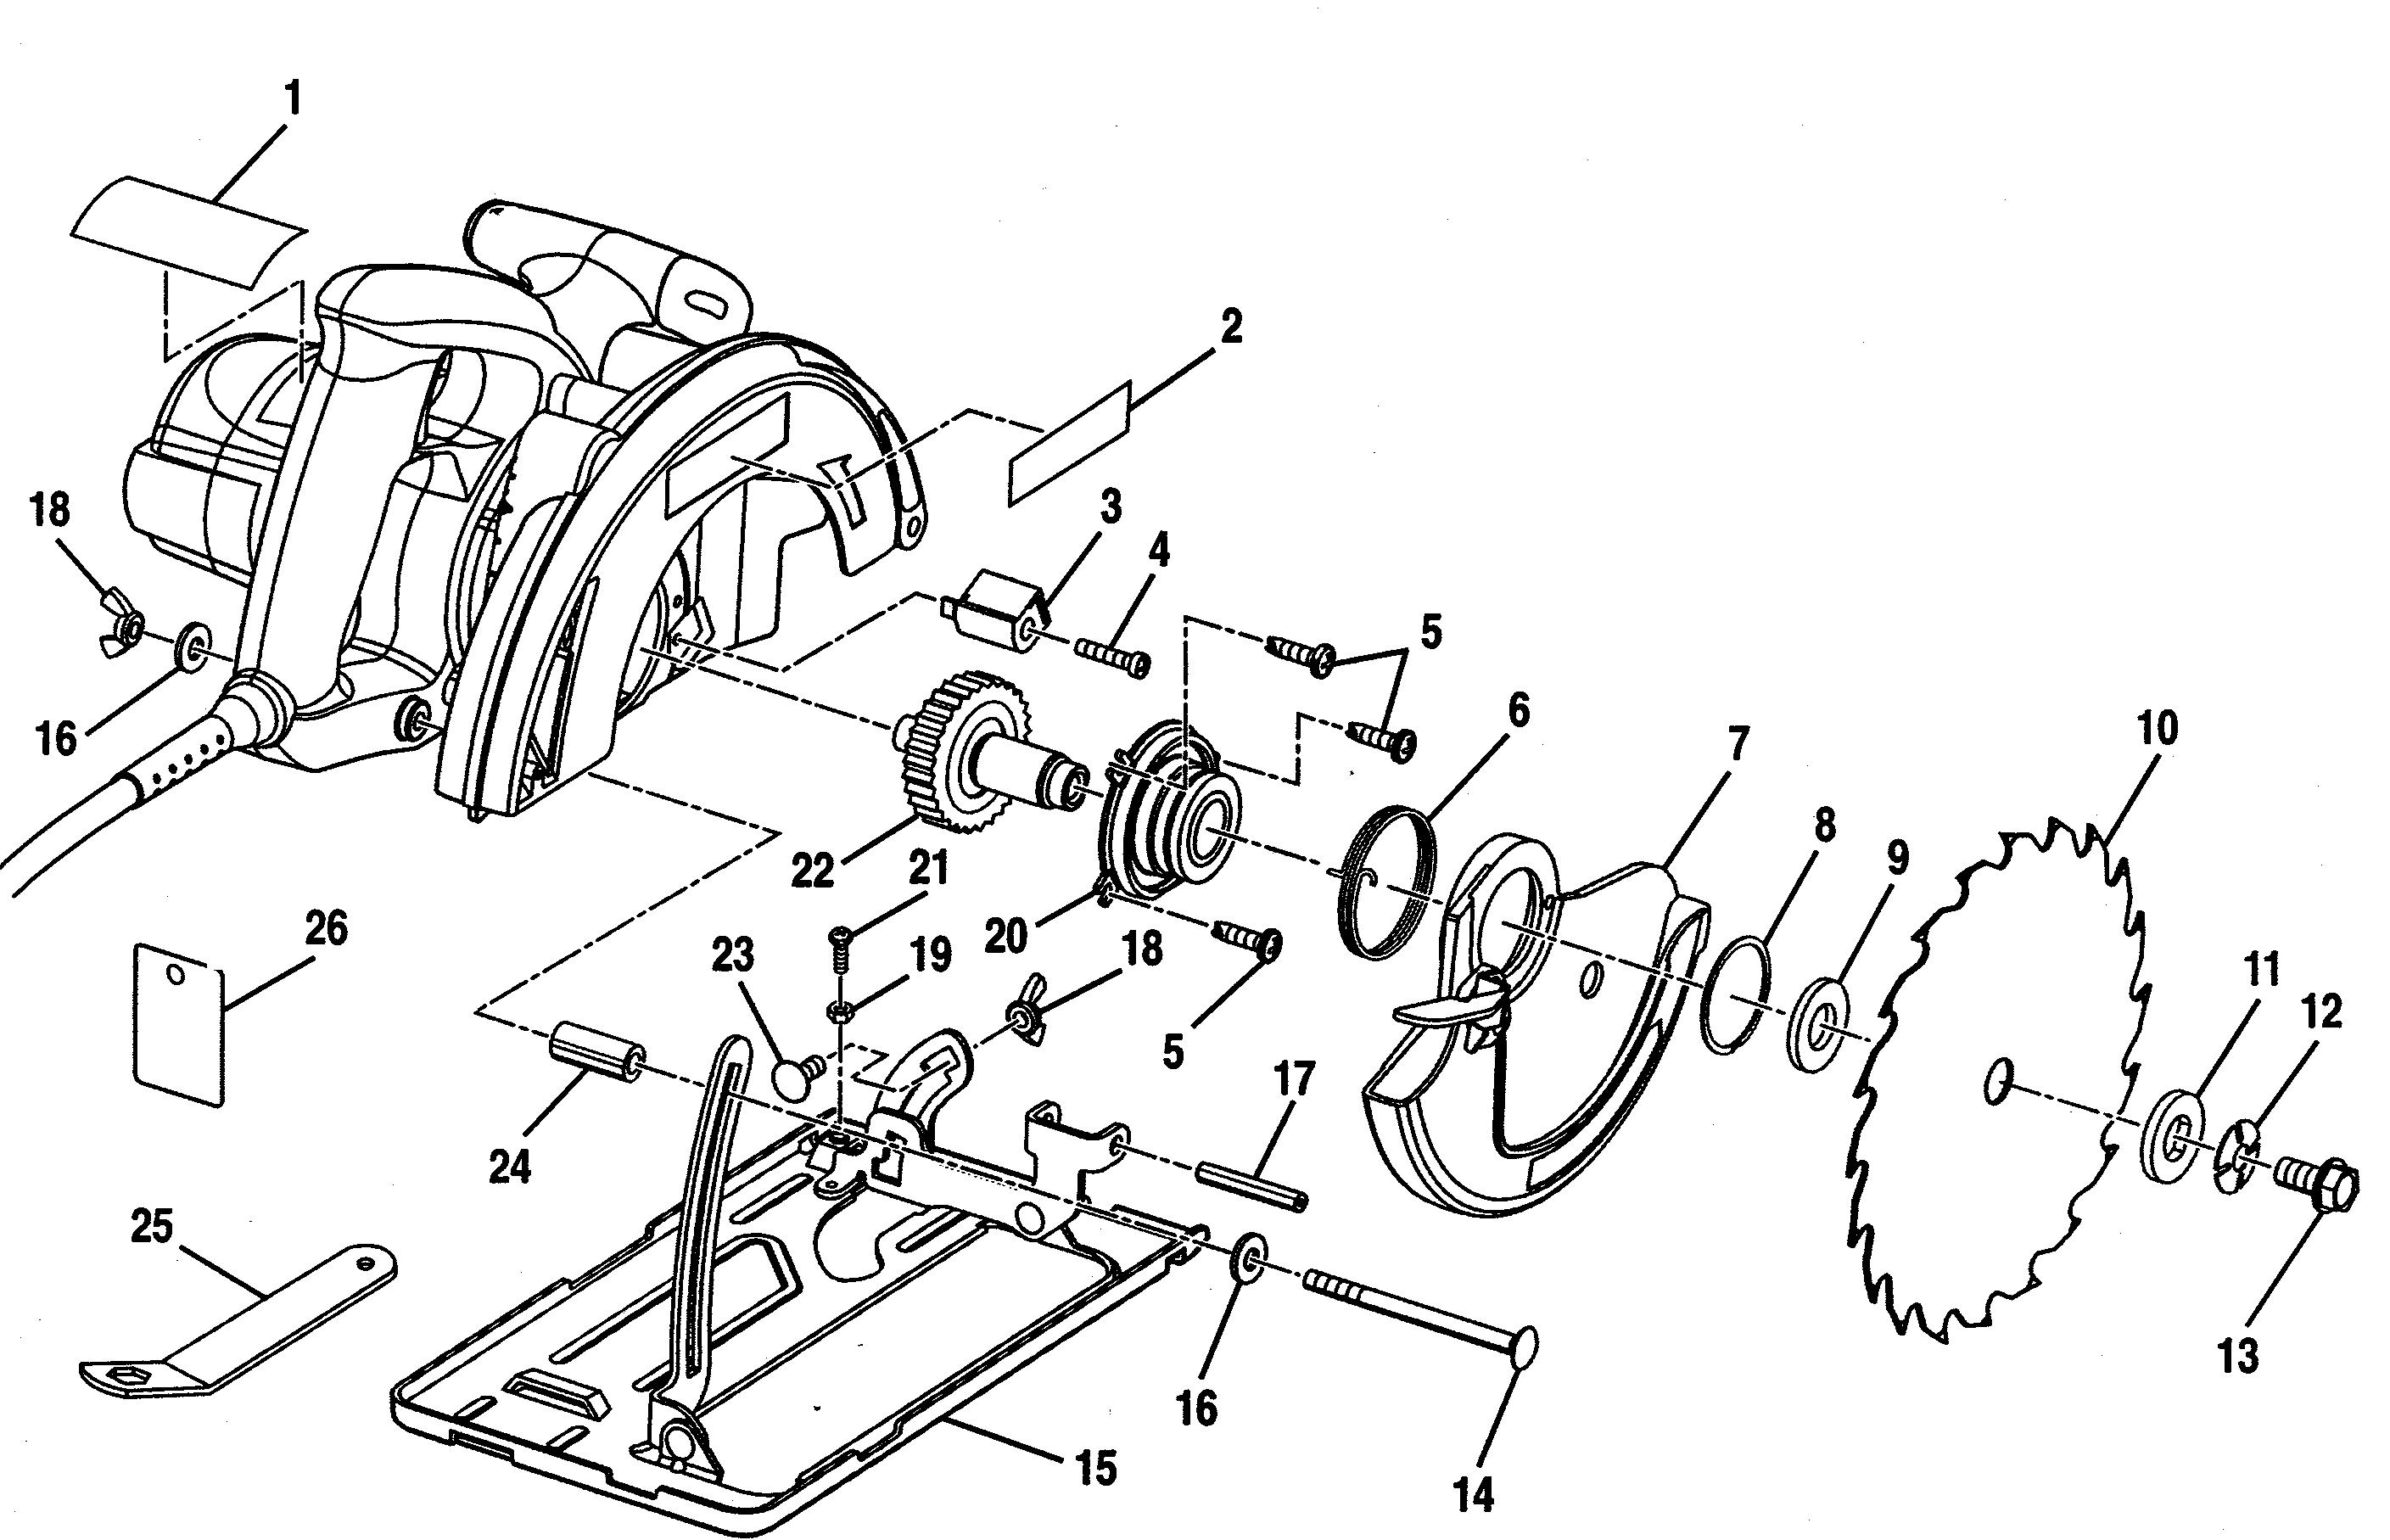 craftsman circular saw model 315108400